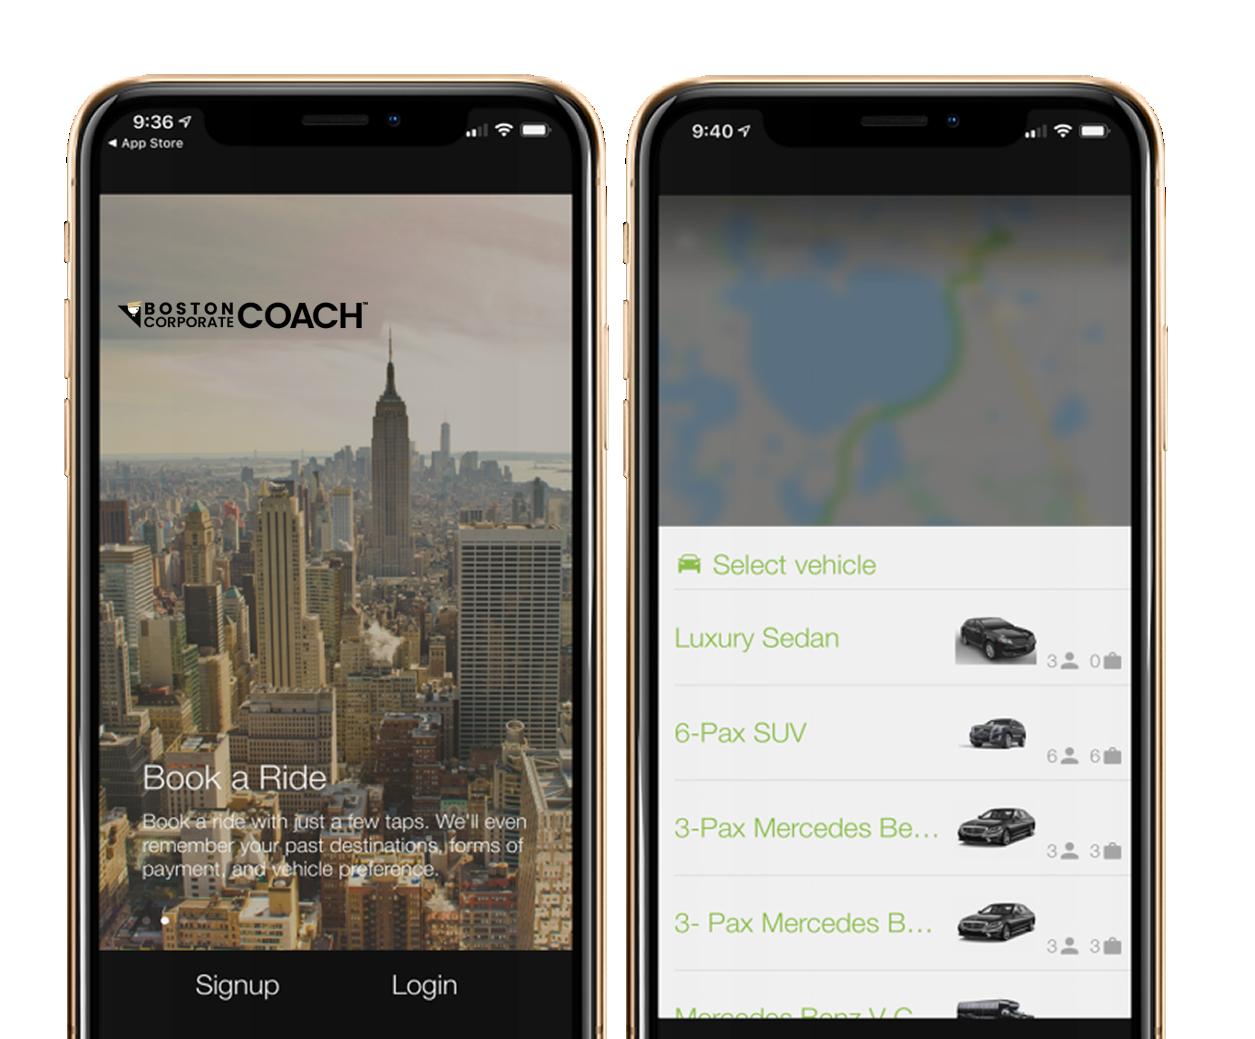 boston corporate coach phone app desktop